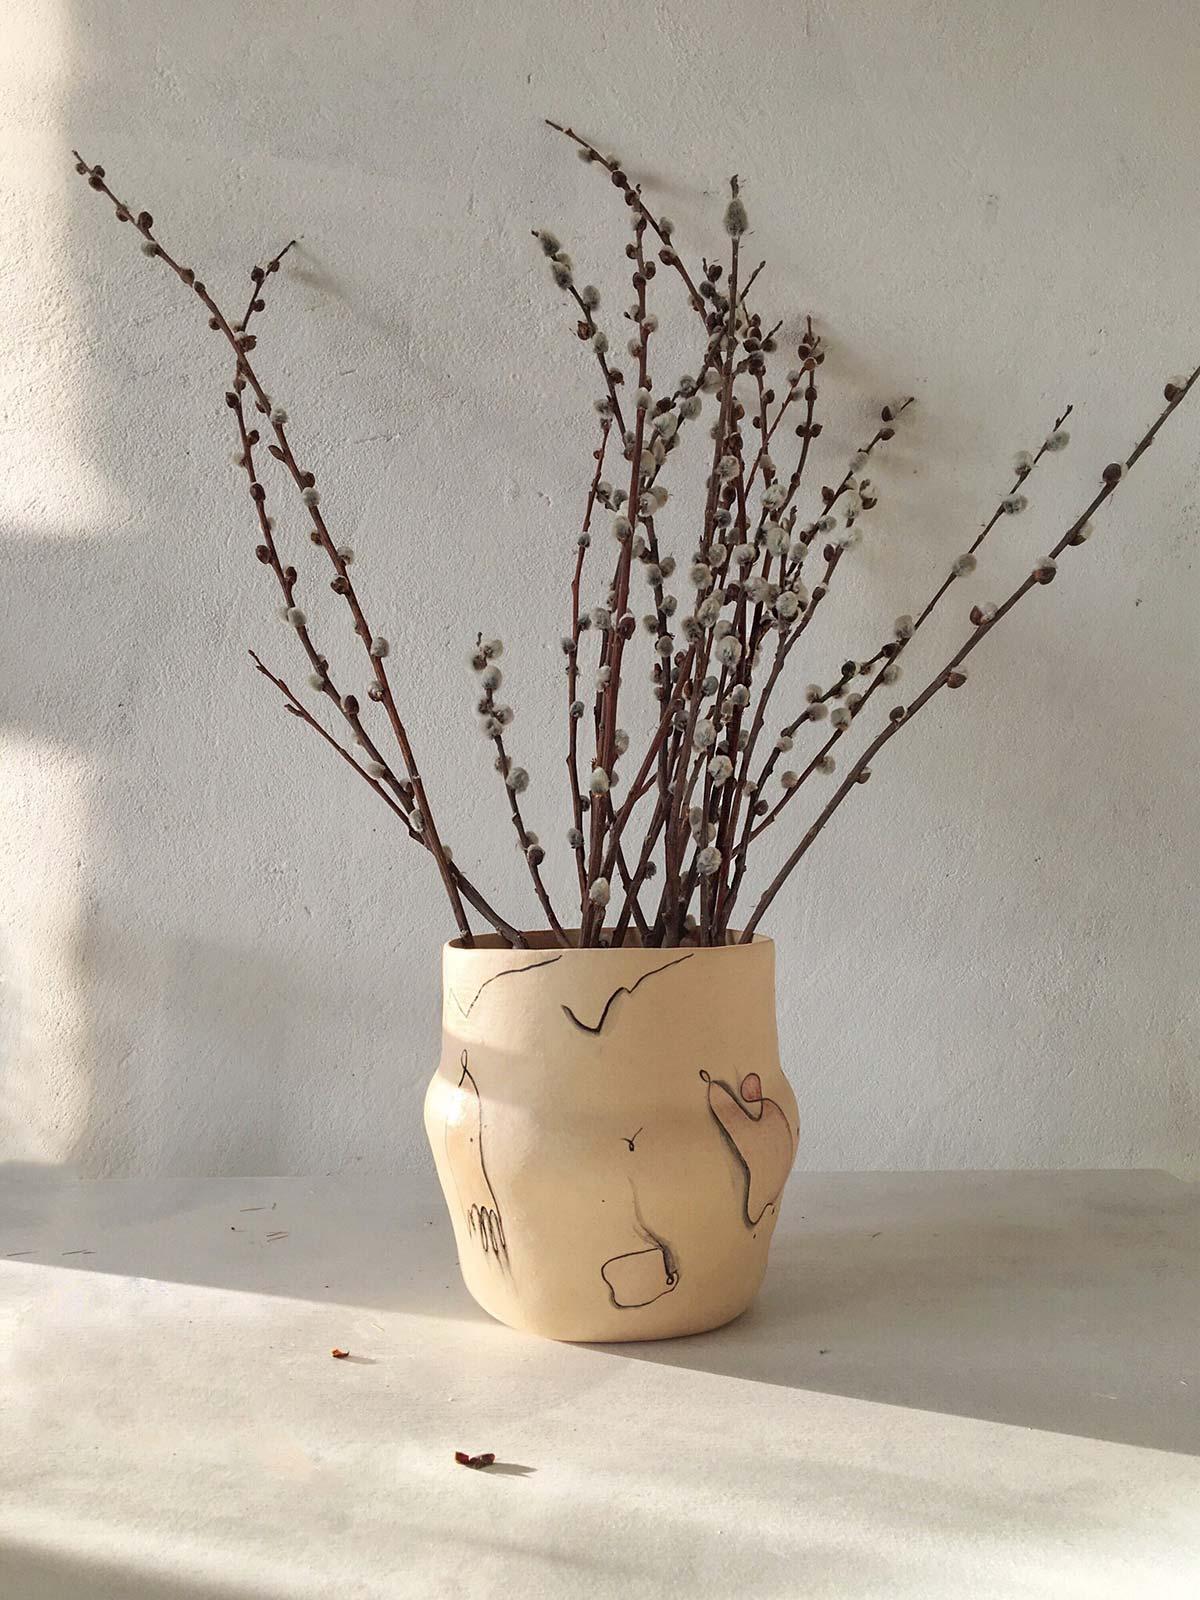 Flowerpot for flowers from ceramics